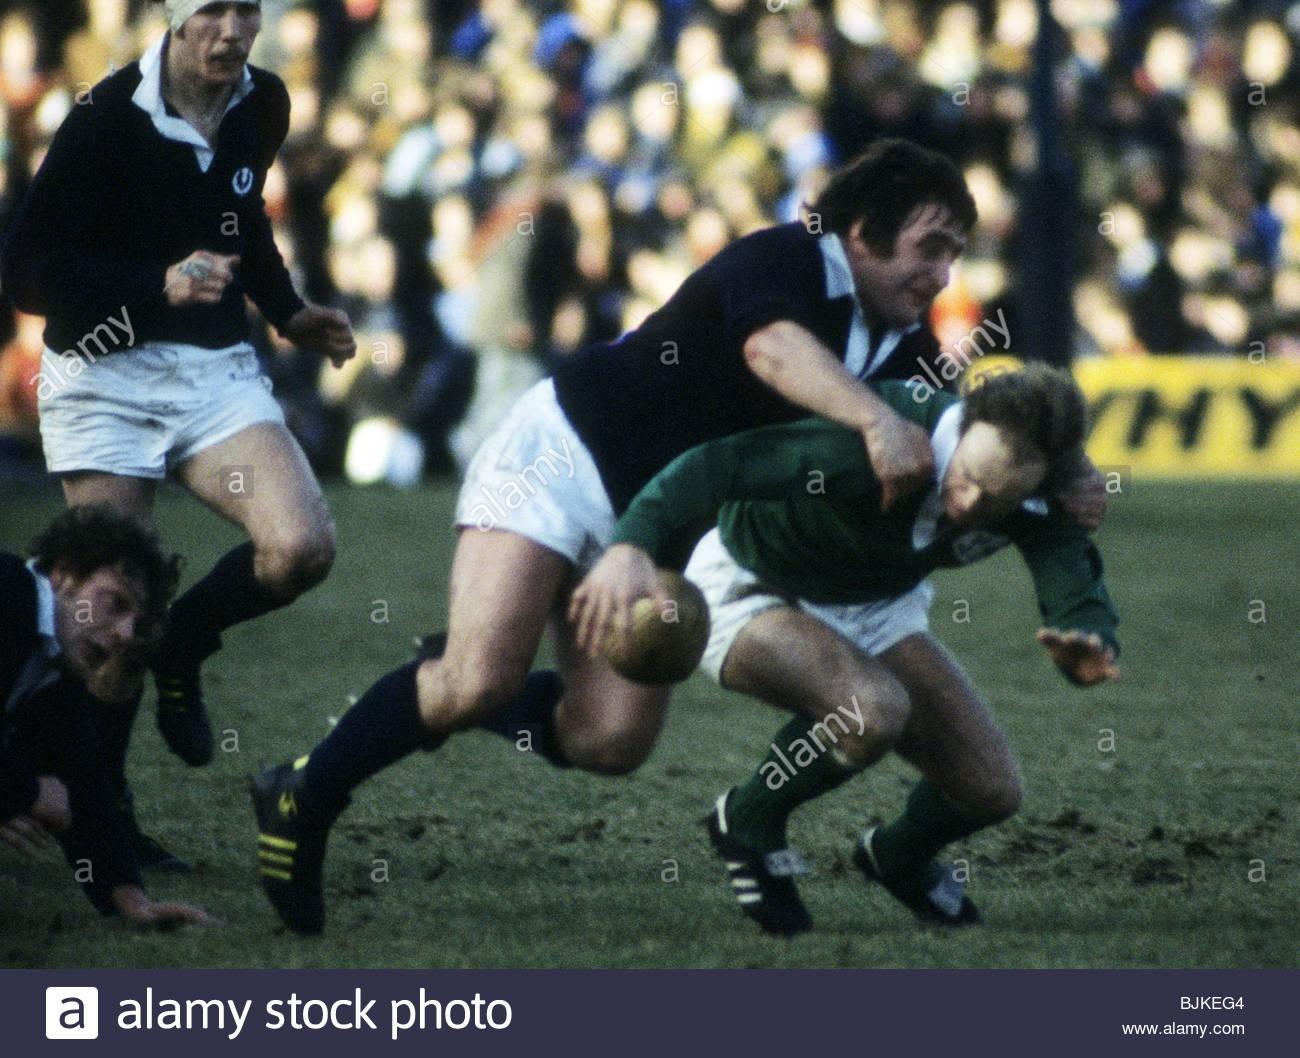 03/03/79 FIVE NATIONS SCOTLAND v IRELAND (11-11) MURRAYFIELD - EDINBURGH Scotland's Ian McLaughlan (left) challenges - Stock Image